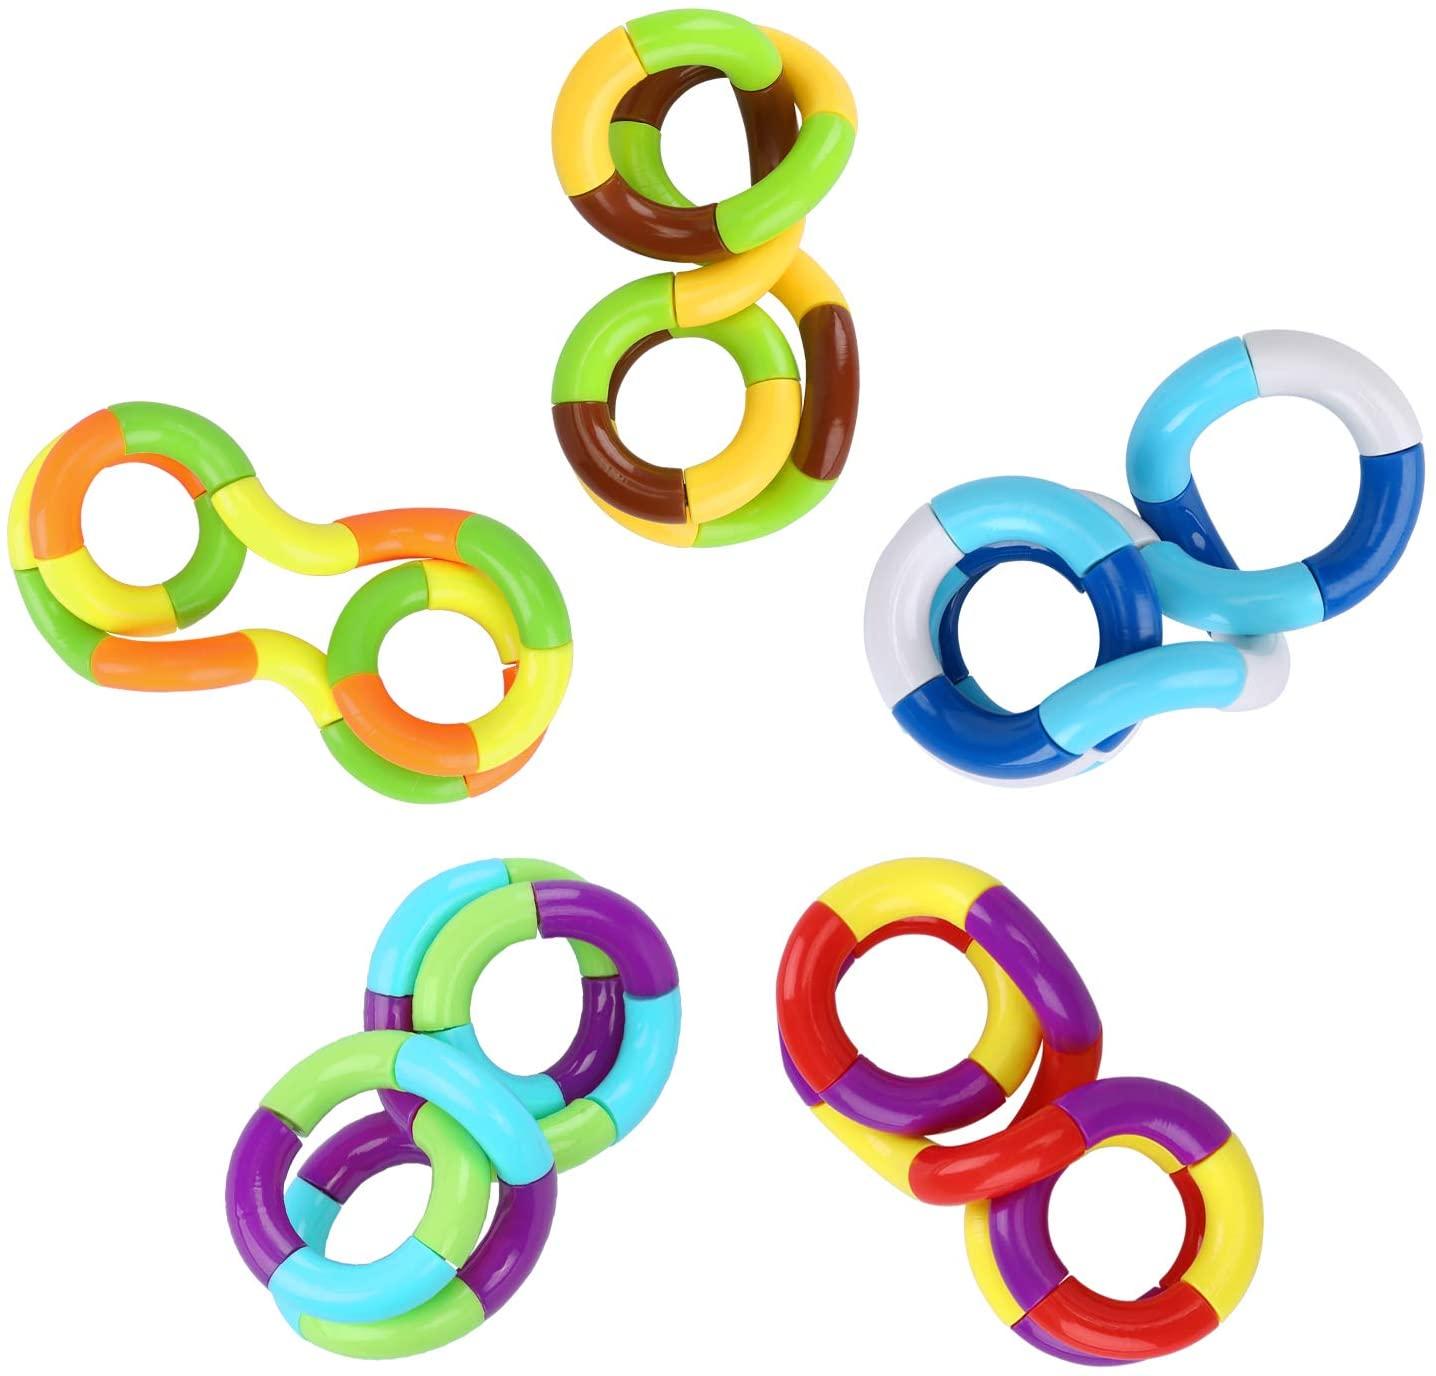 Fidget Fiddle Twist String Tangles Toys Relax Anxiety Stress ADHD Sensory Aid;